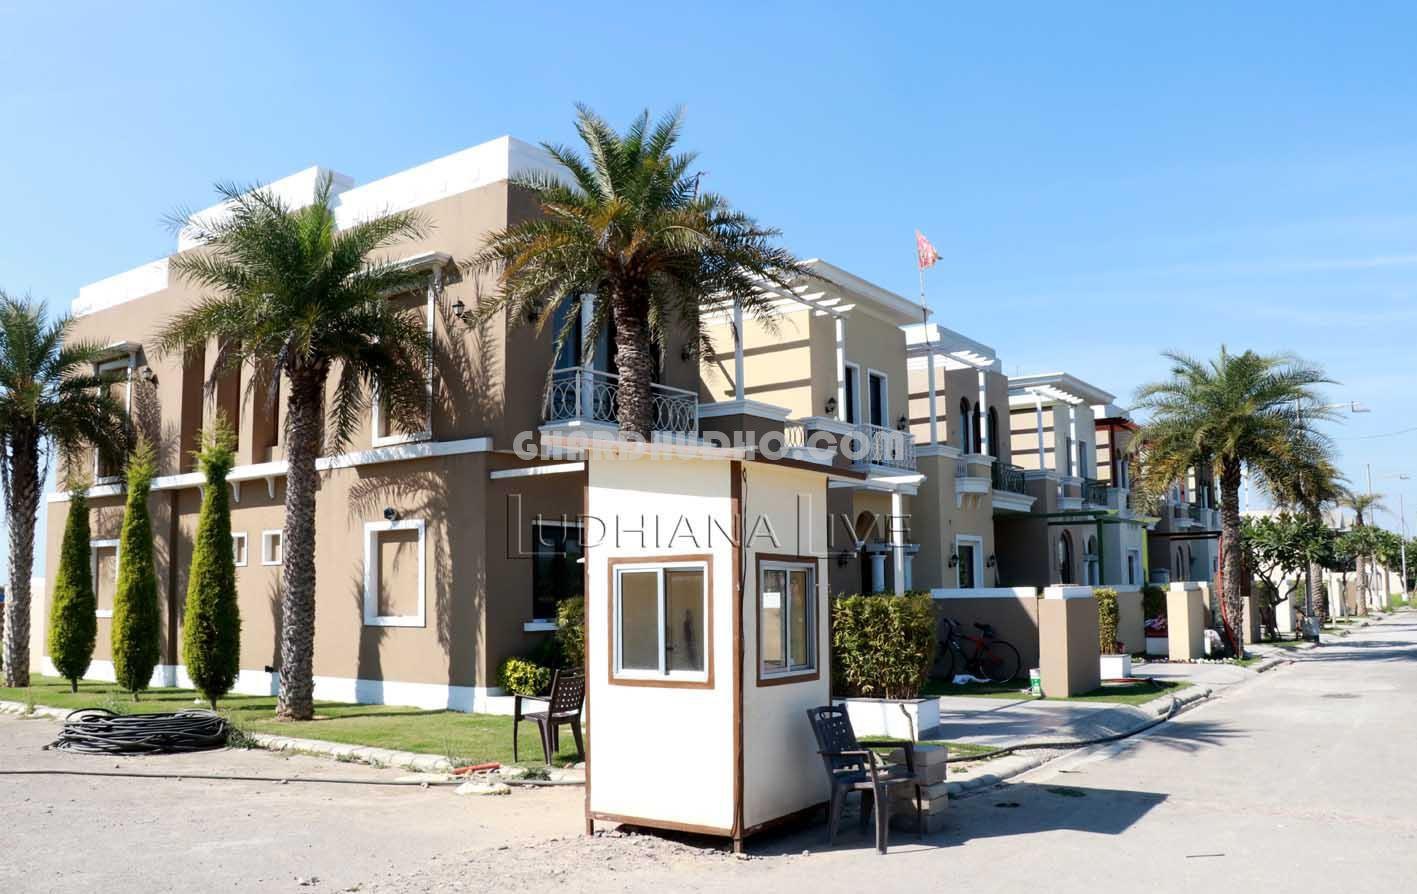 Aanand Villas : Ultra Premium Luxury 3 BHK Duplex Home In Ludhiyana Panjab